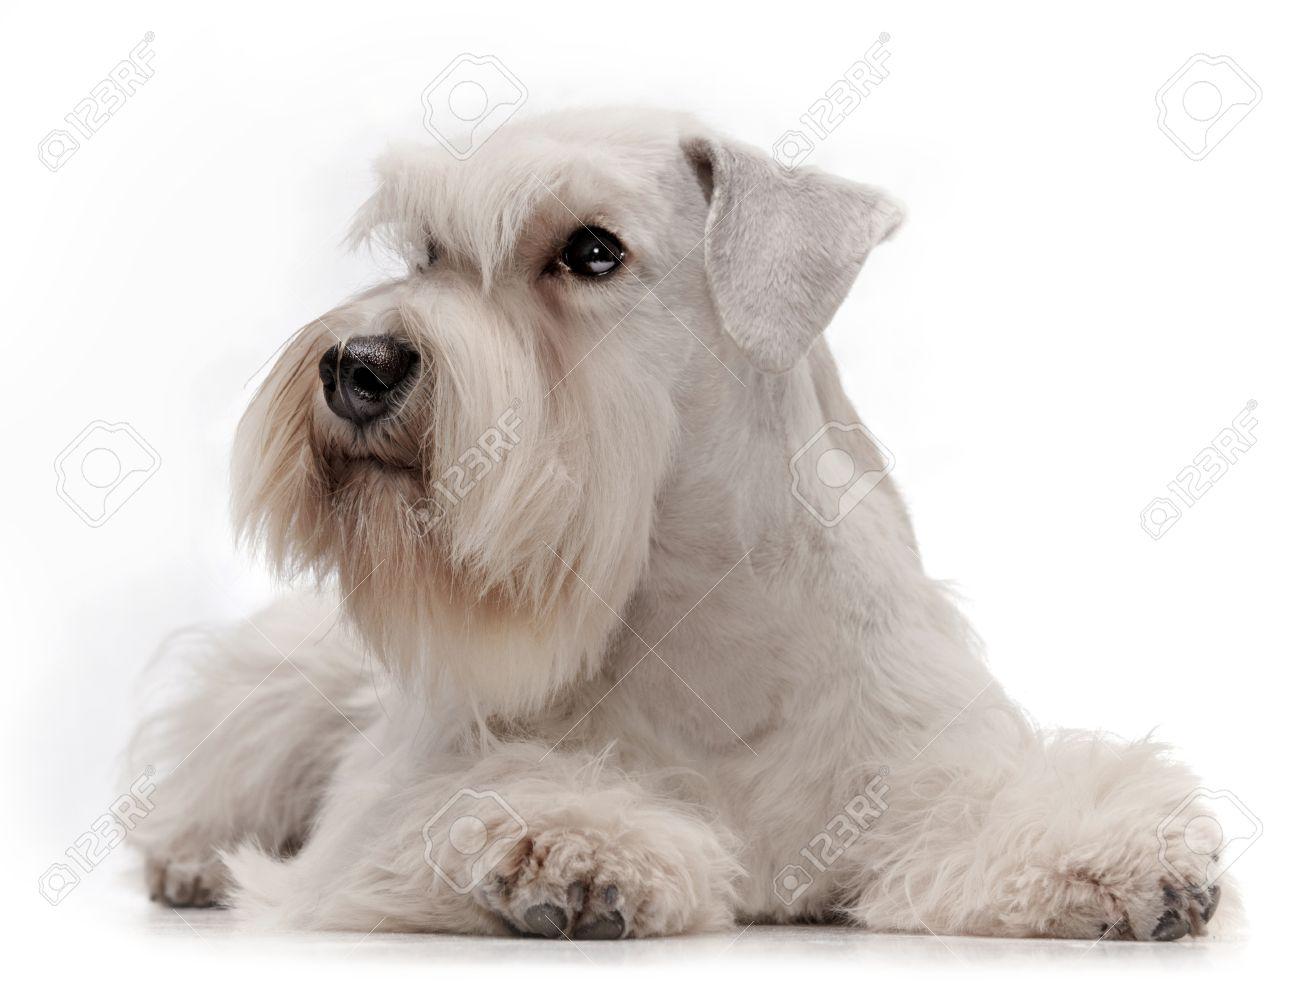 White Miniature Schnauzer white miniature schnauzer